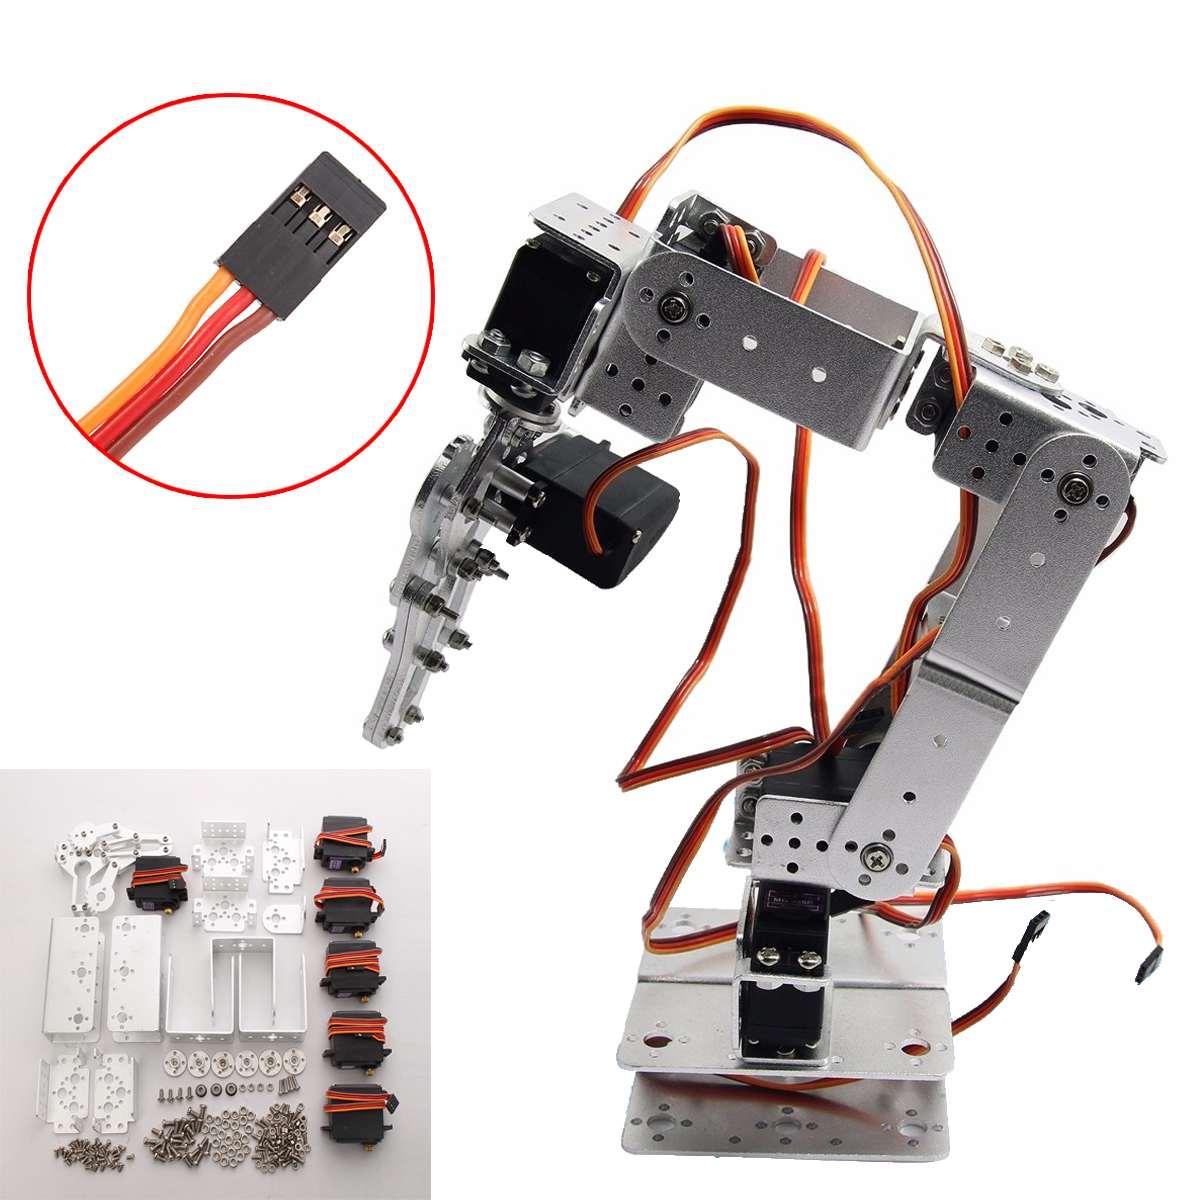 Aluminium Robot 6 DOF Arm Mechanical Robotic Arm Clamp Claw Mount Kit W/Servos Servo Horn For Arduino-Silver Action Toy Figure